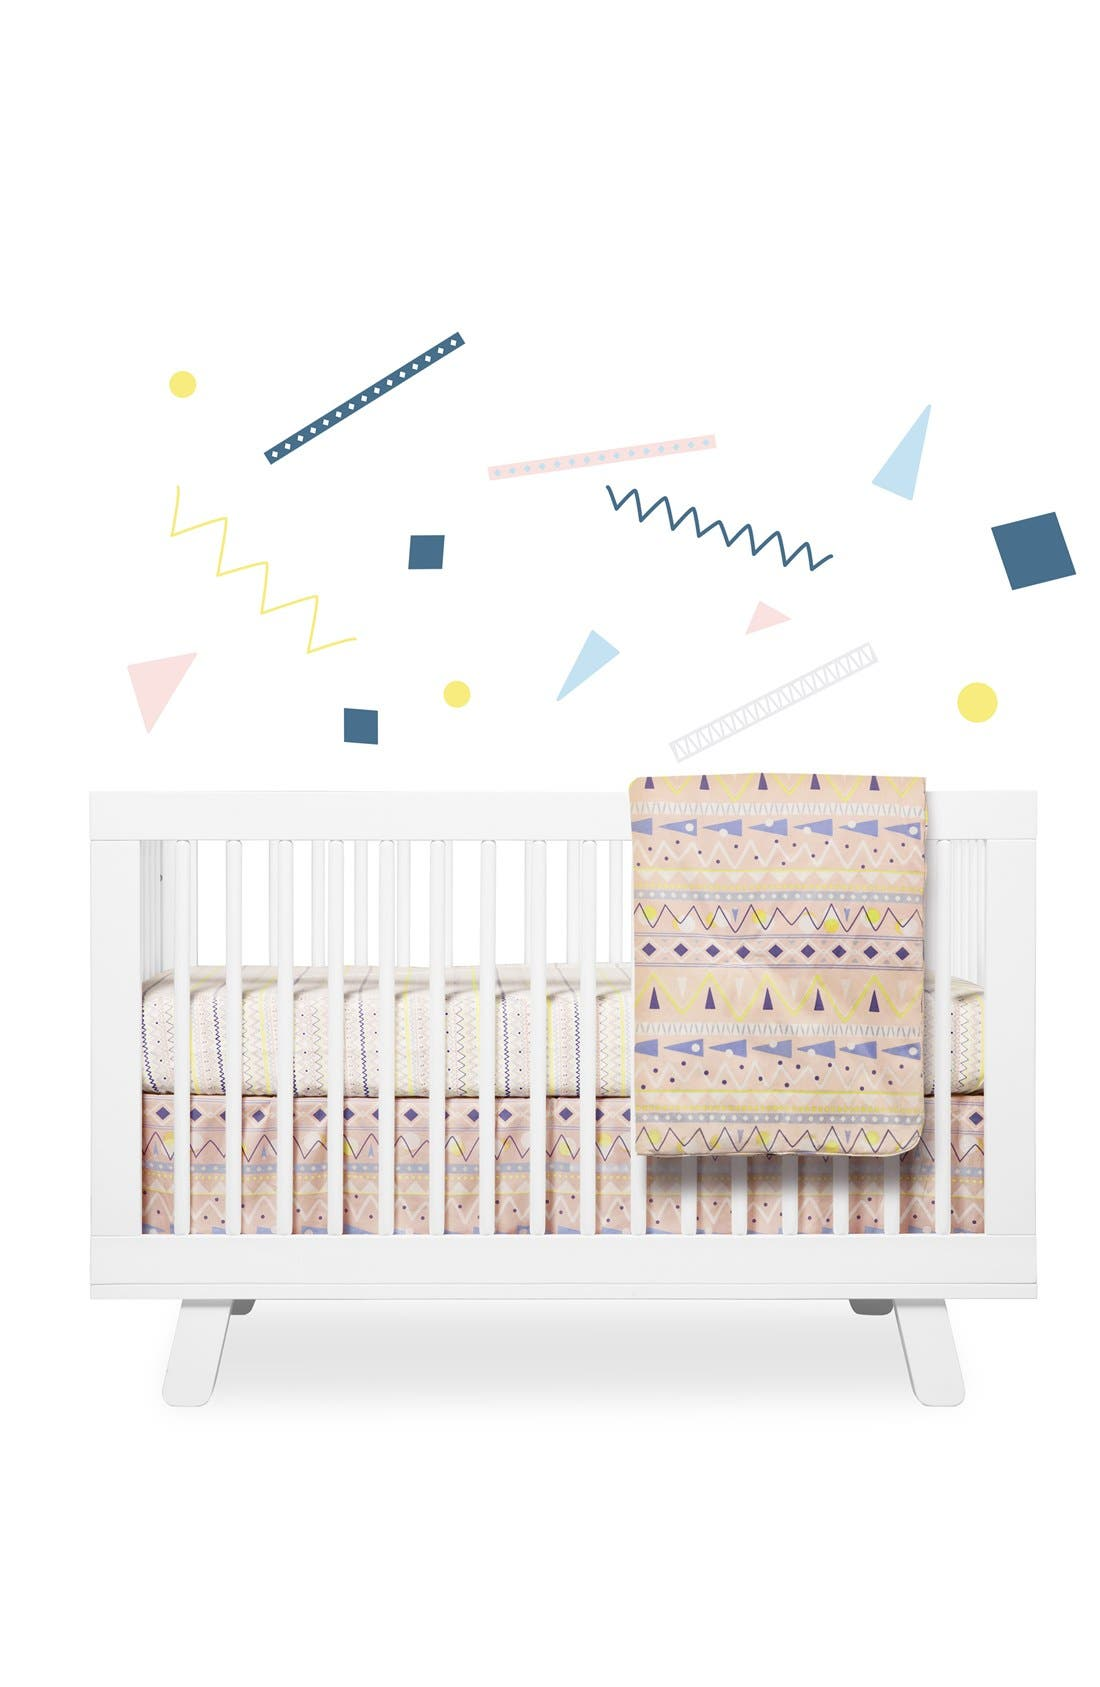 babyletto 'Desert' Crib Sheet, Crib Skirt, Stroller Blanket & Wall Decals